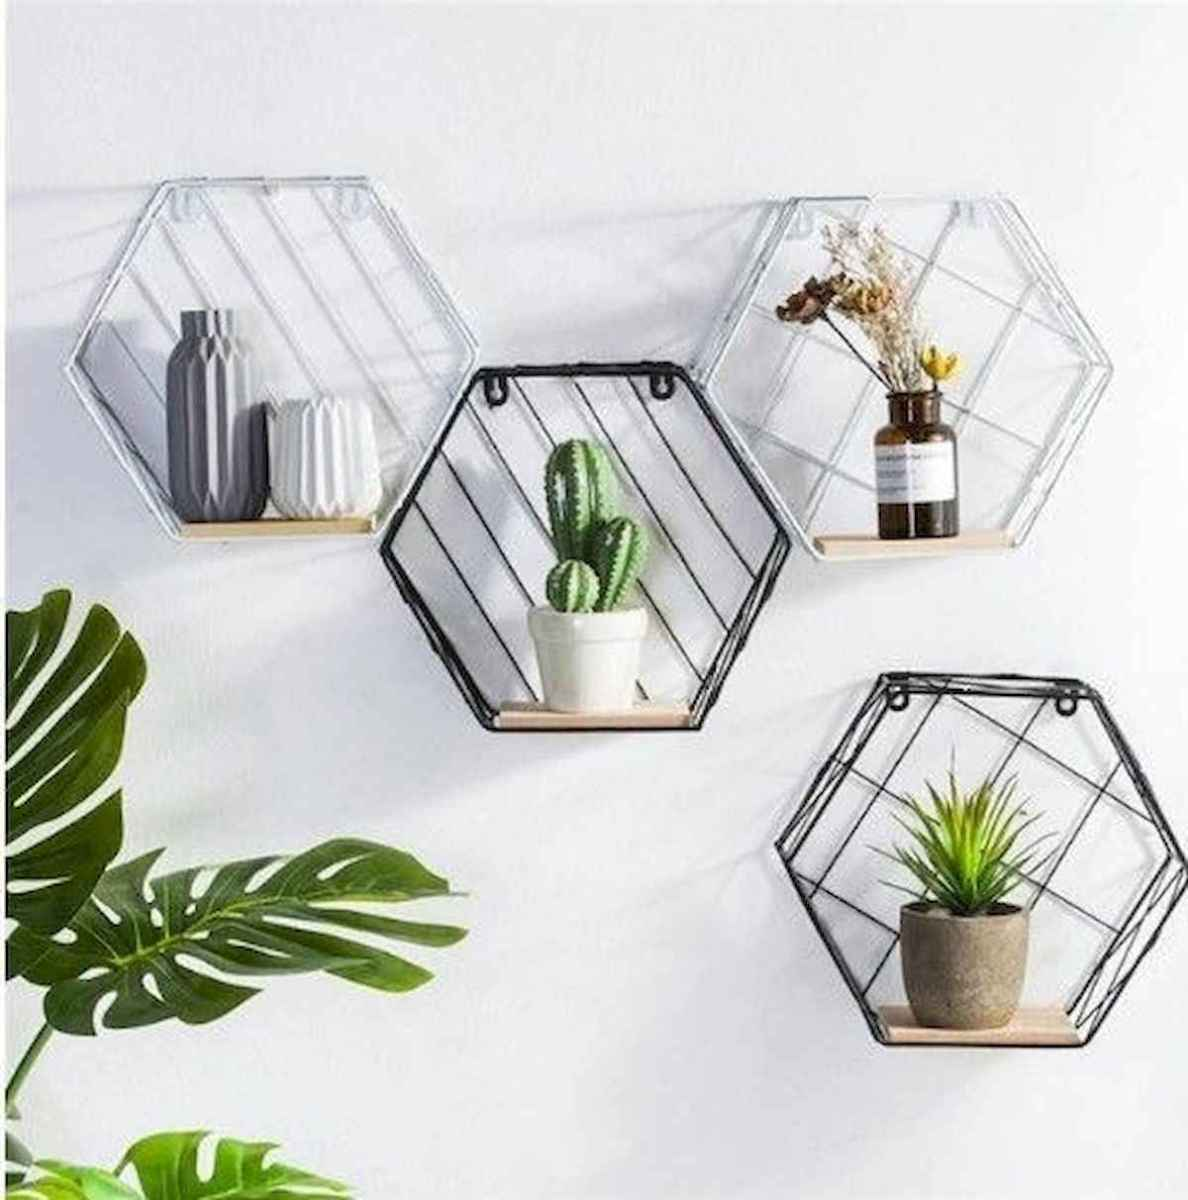 50 Fantastic DIY Home Decor Ideas On A Budget (12)